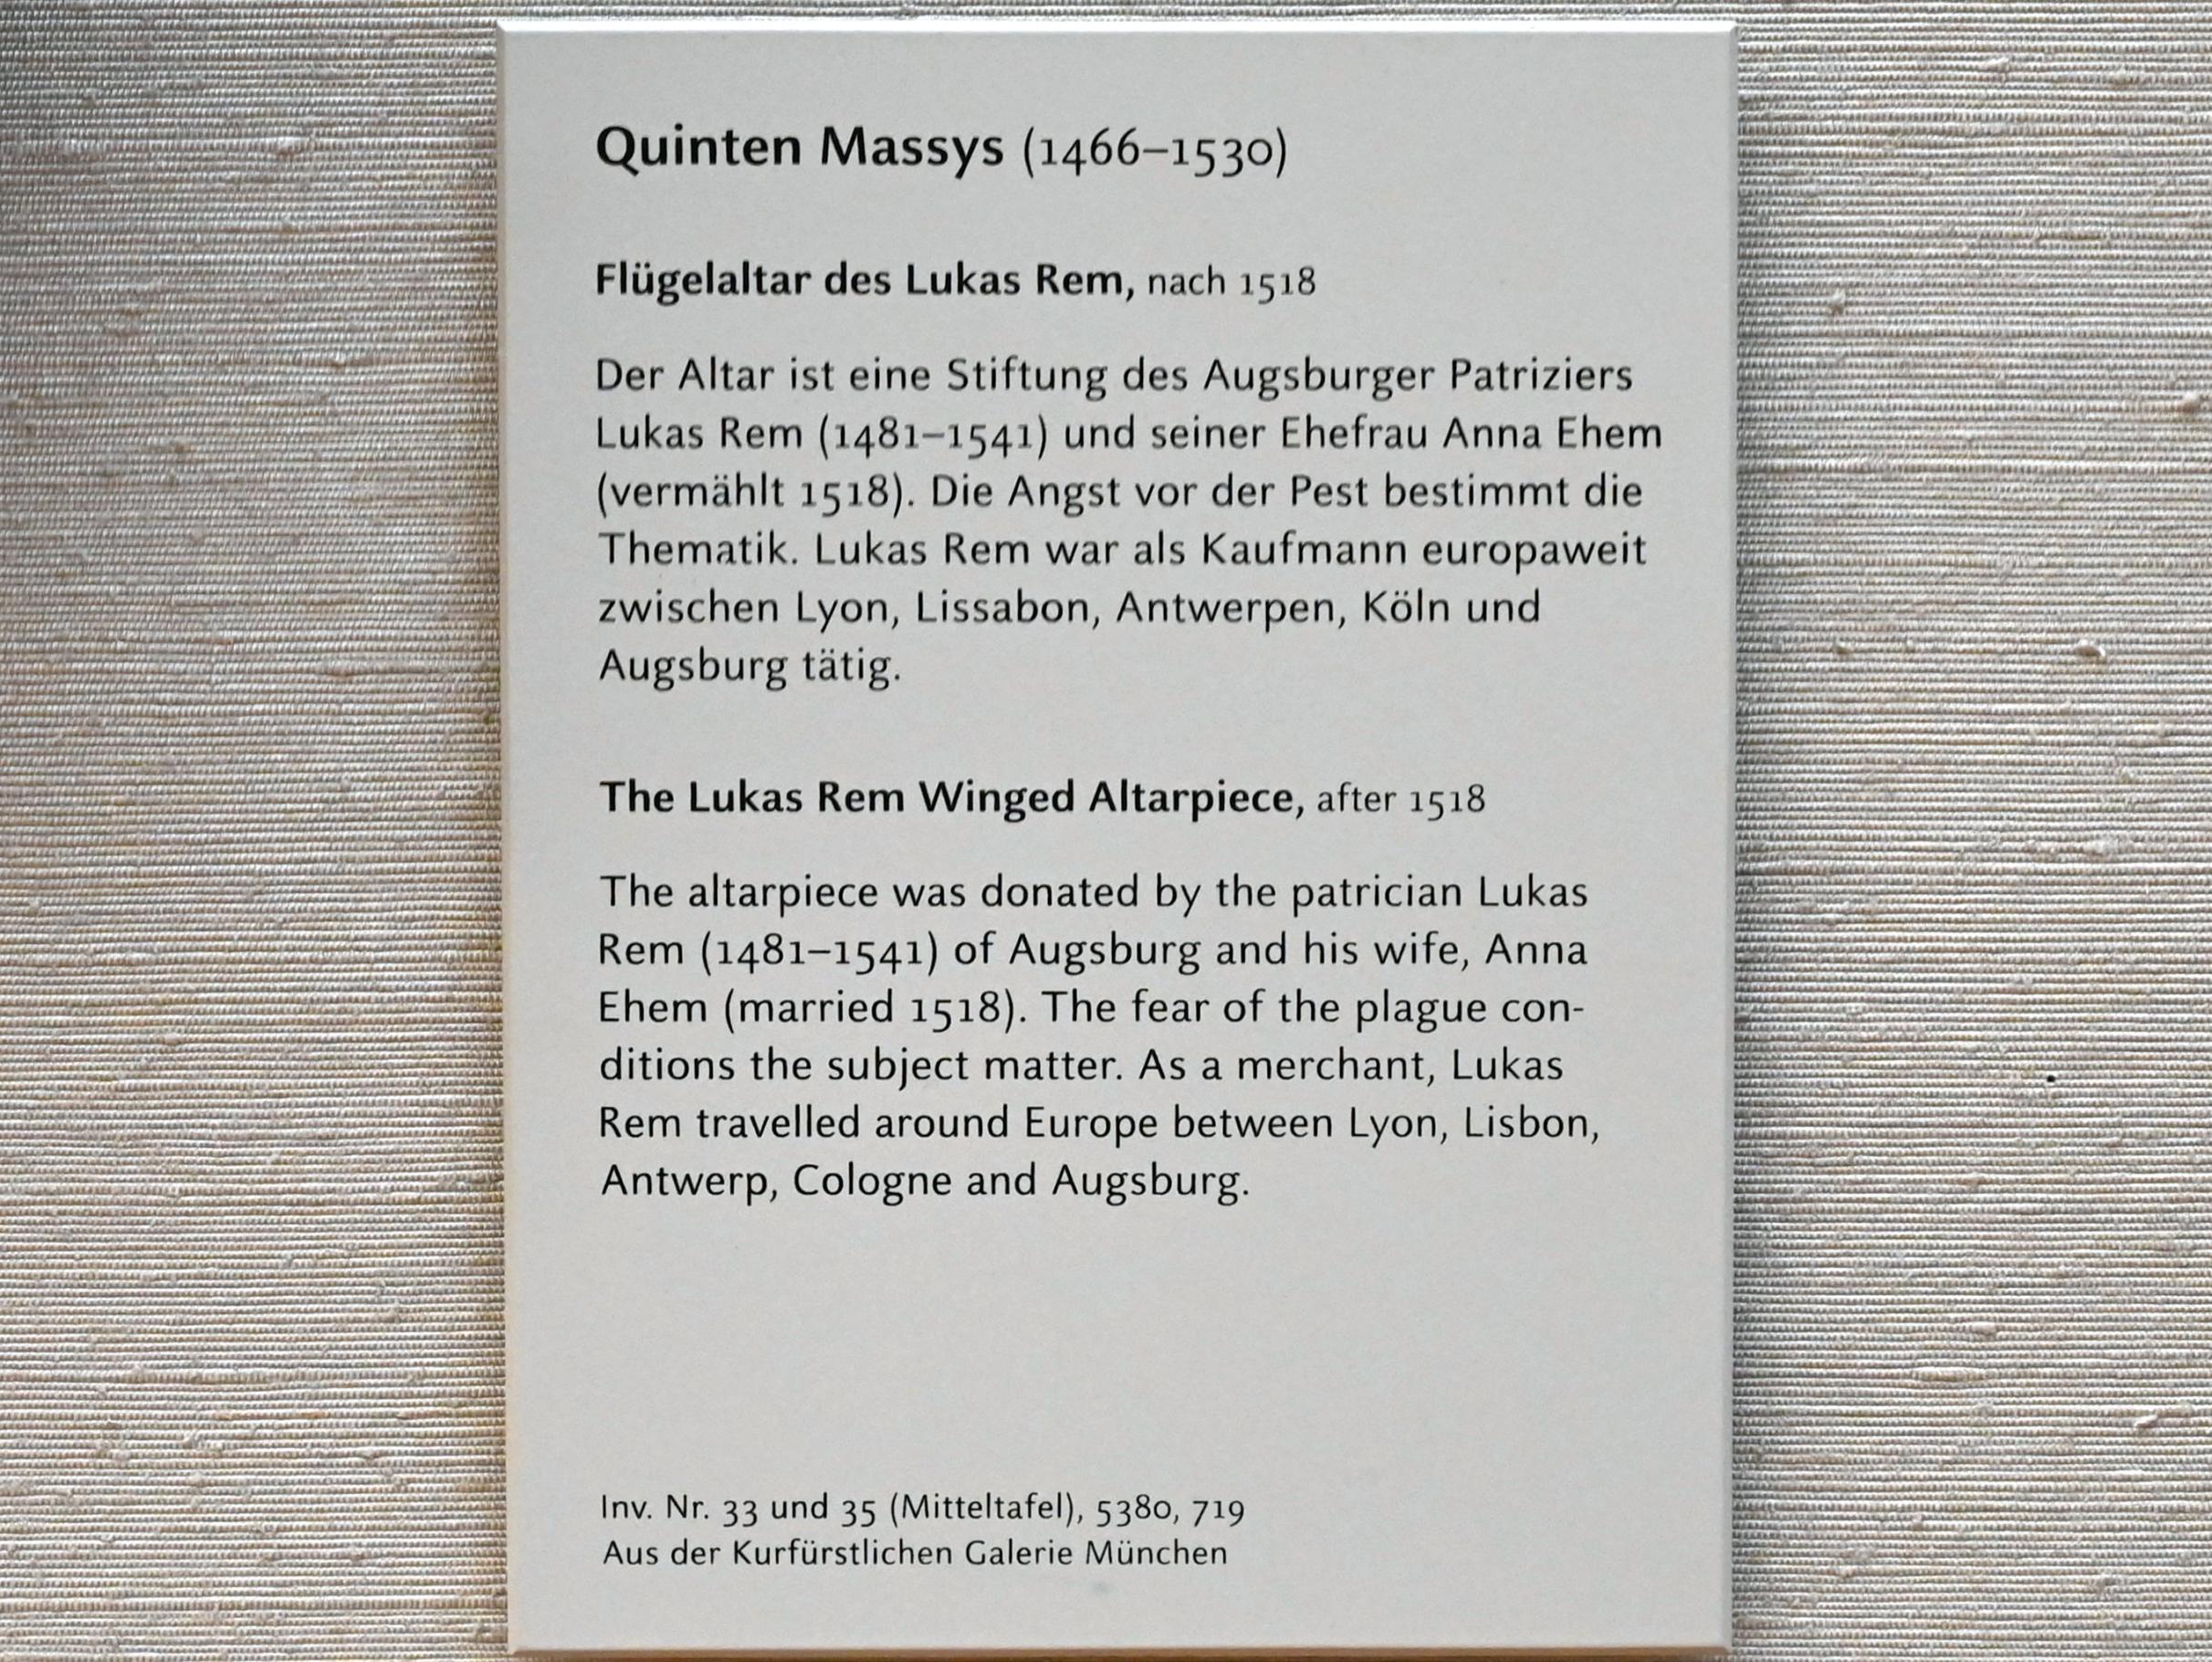 Quinten Massys: Flügelaltar des Lukas Rem, nach 1518, Bild 2/2